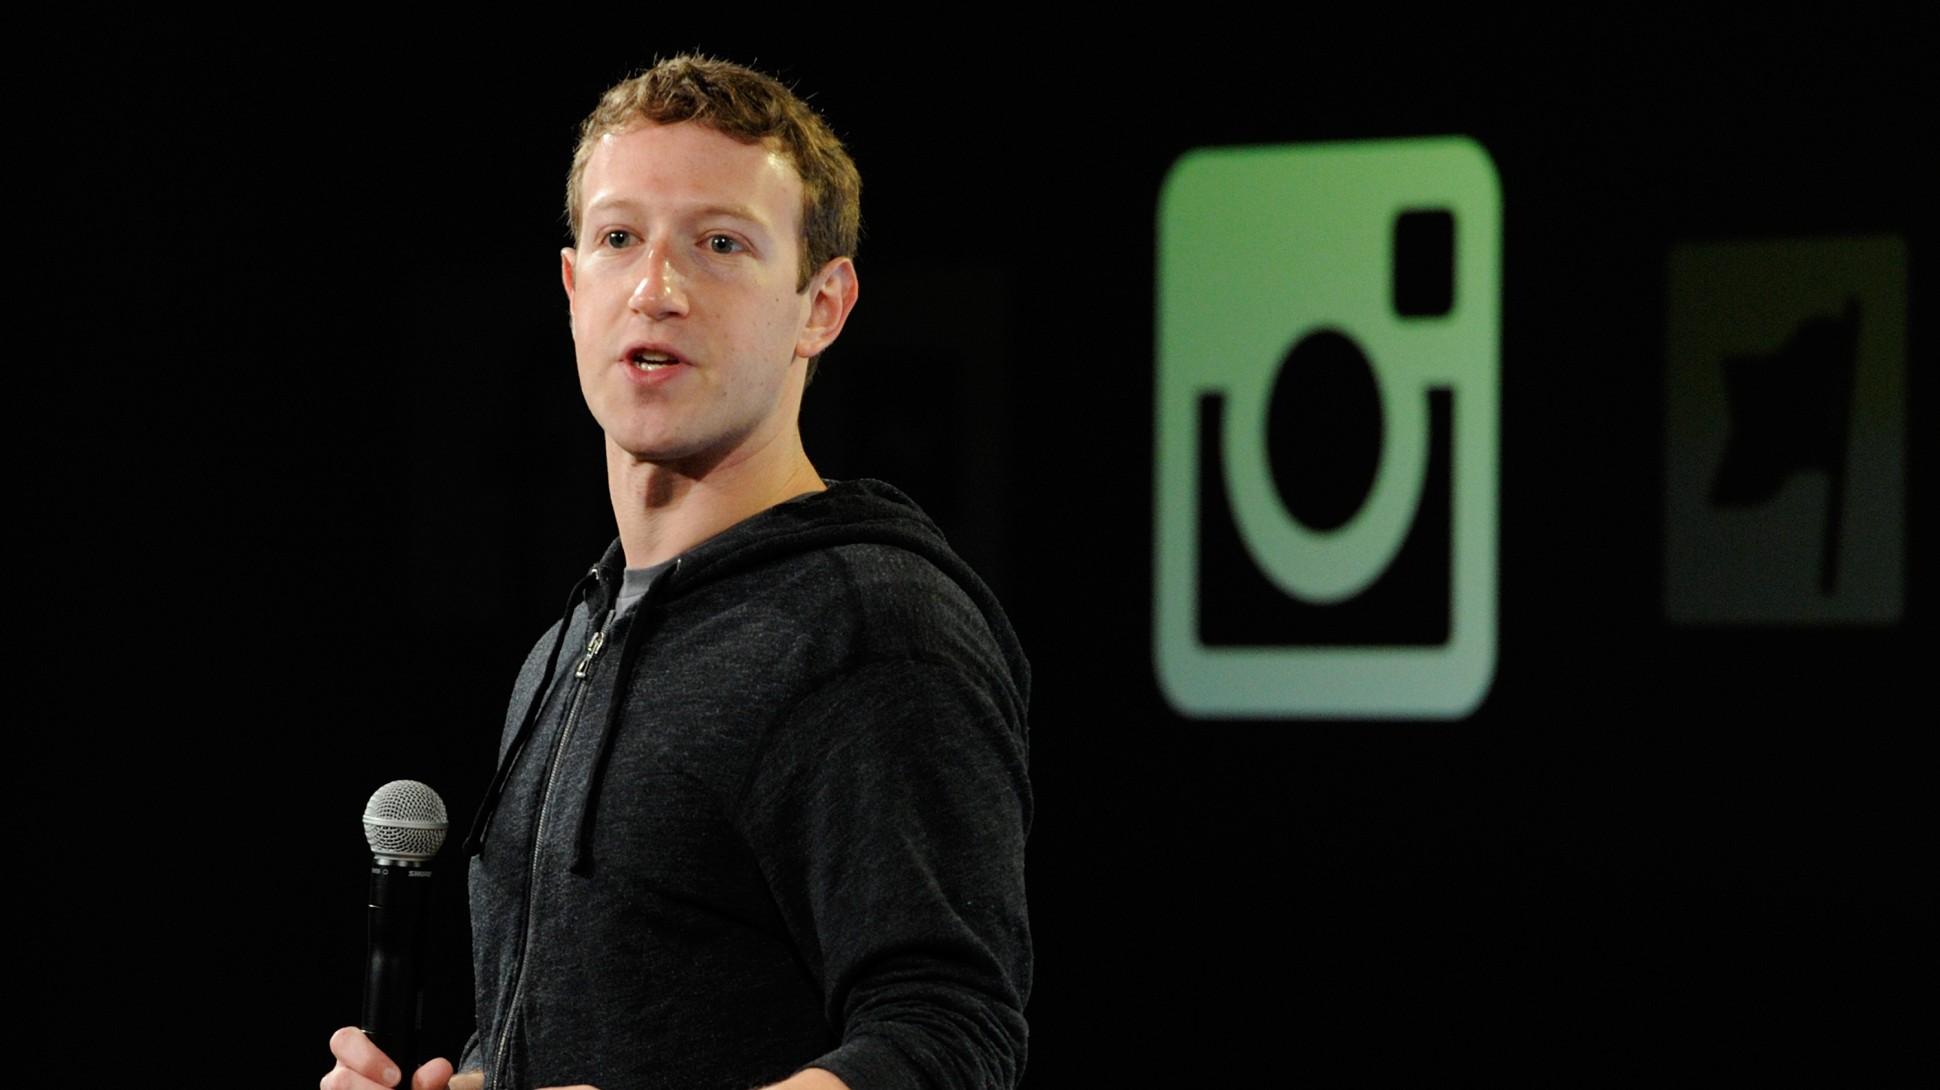 Mark Zuckerberg Wallpaper Pictures 59720 1940x1090px 1940x1090